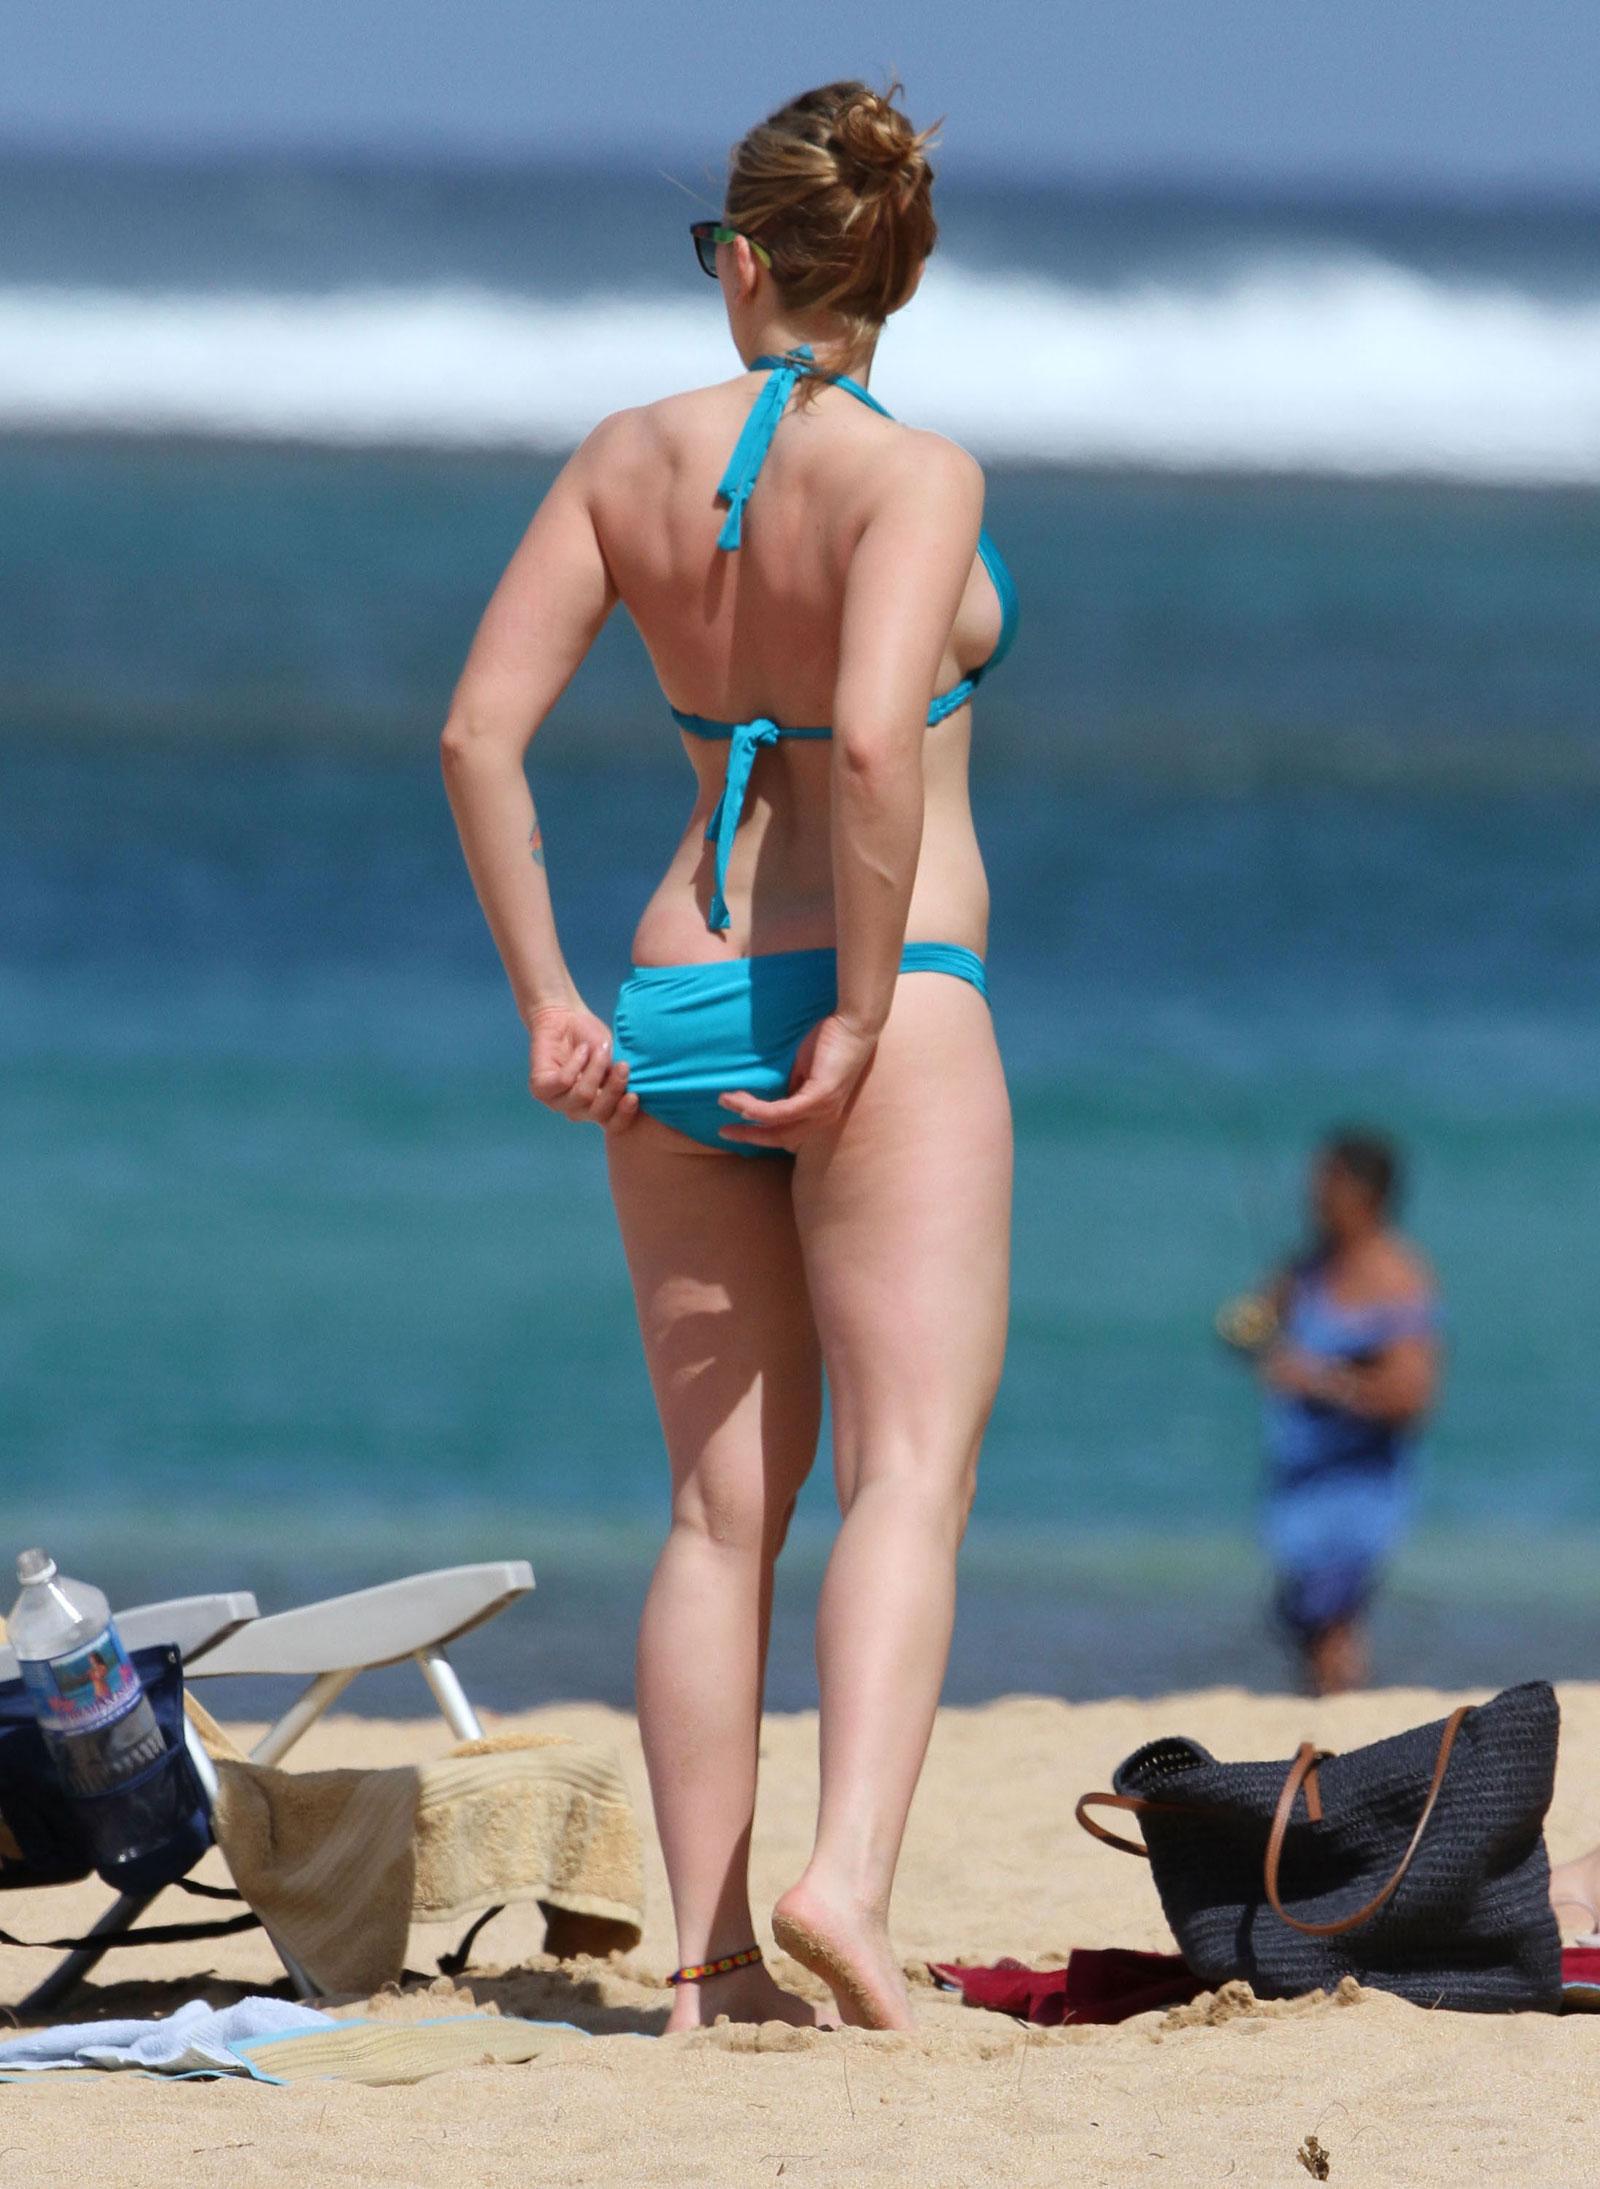 Sleep Number Bed Store Scarlett Johansson in Bikini at a Beach in Hawaii ...